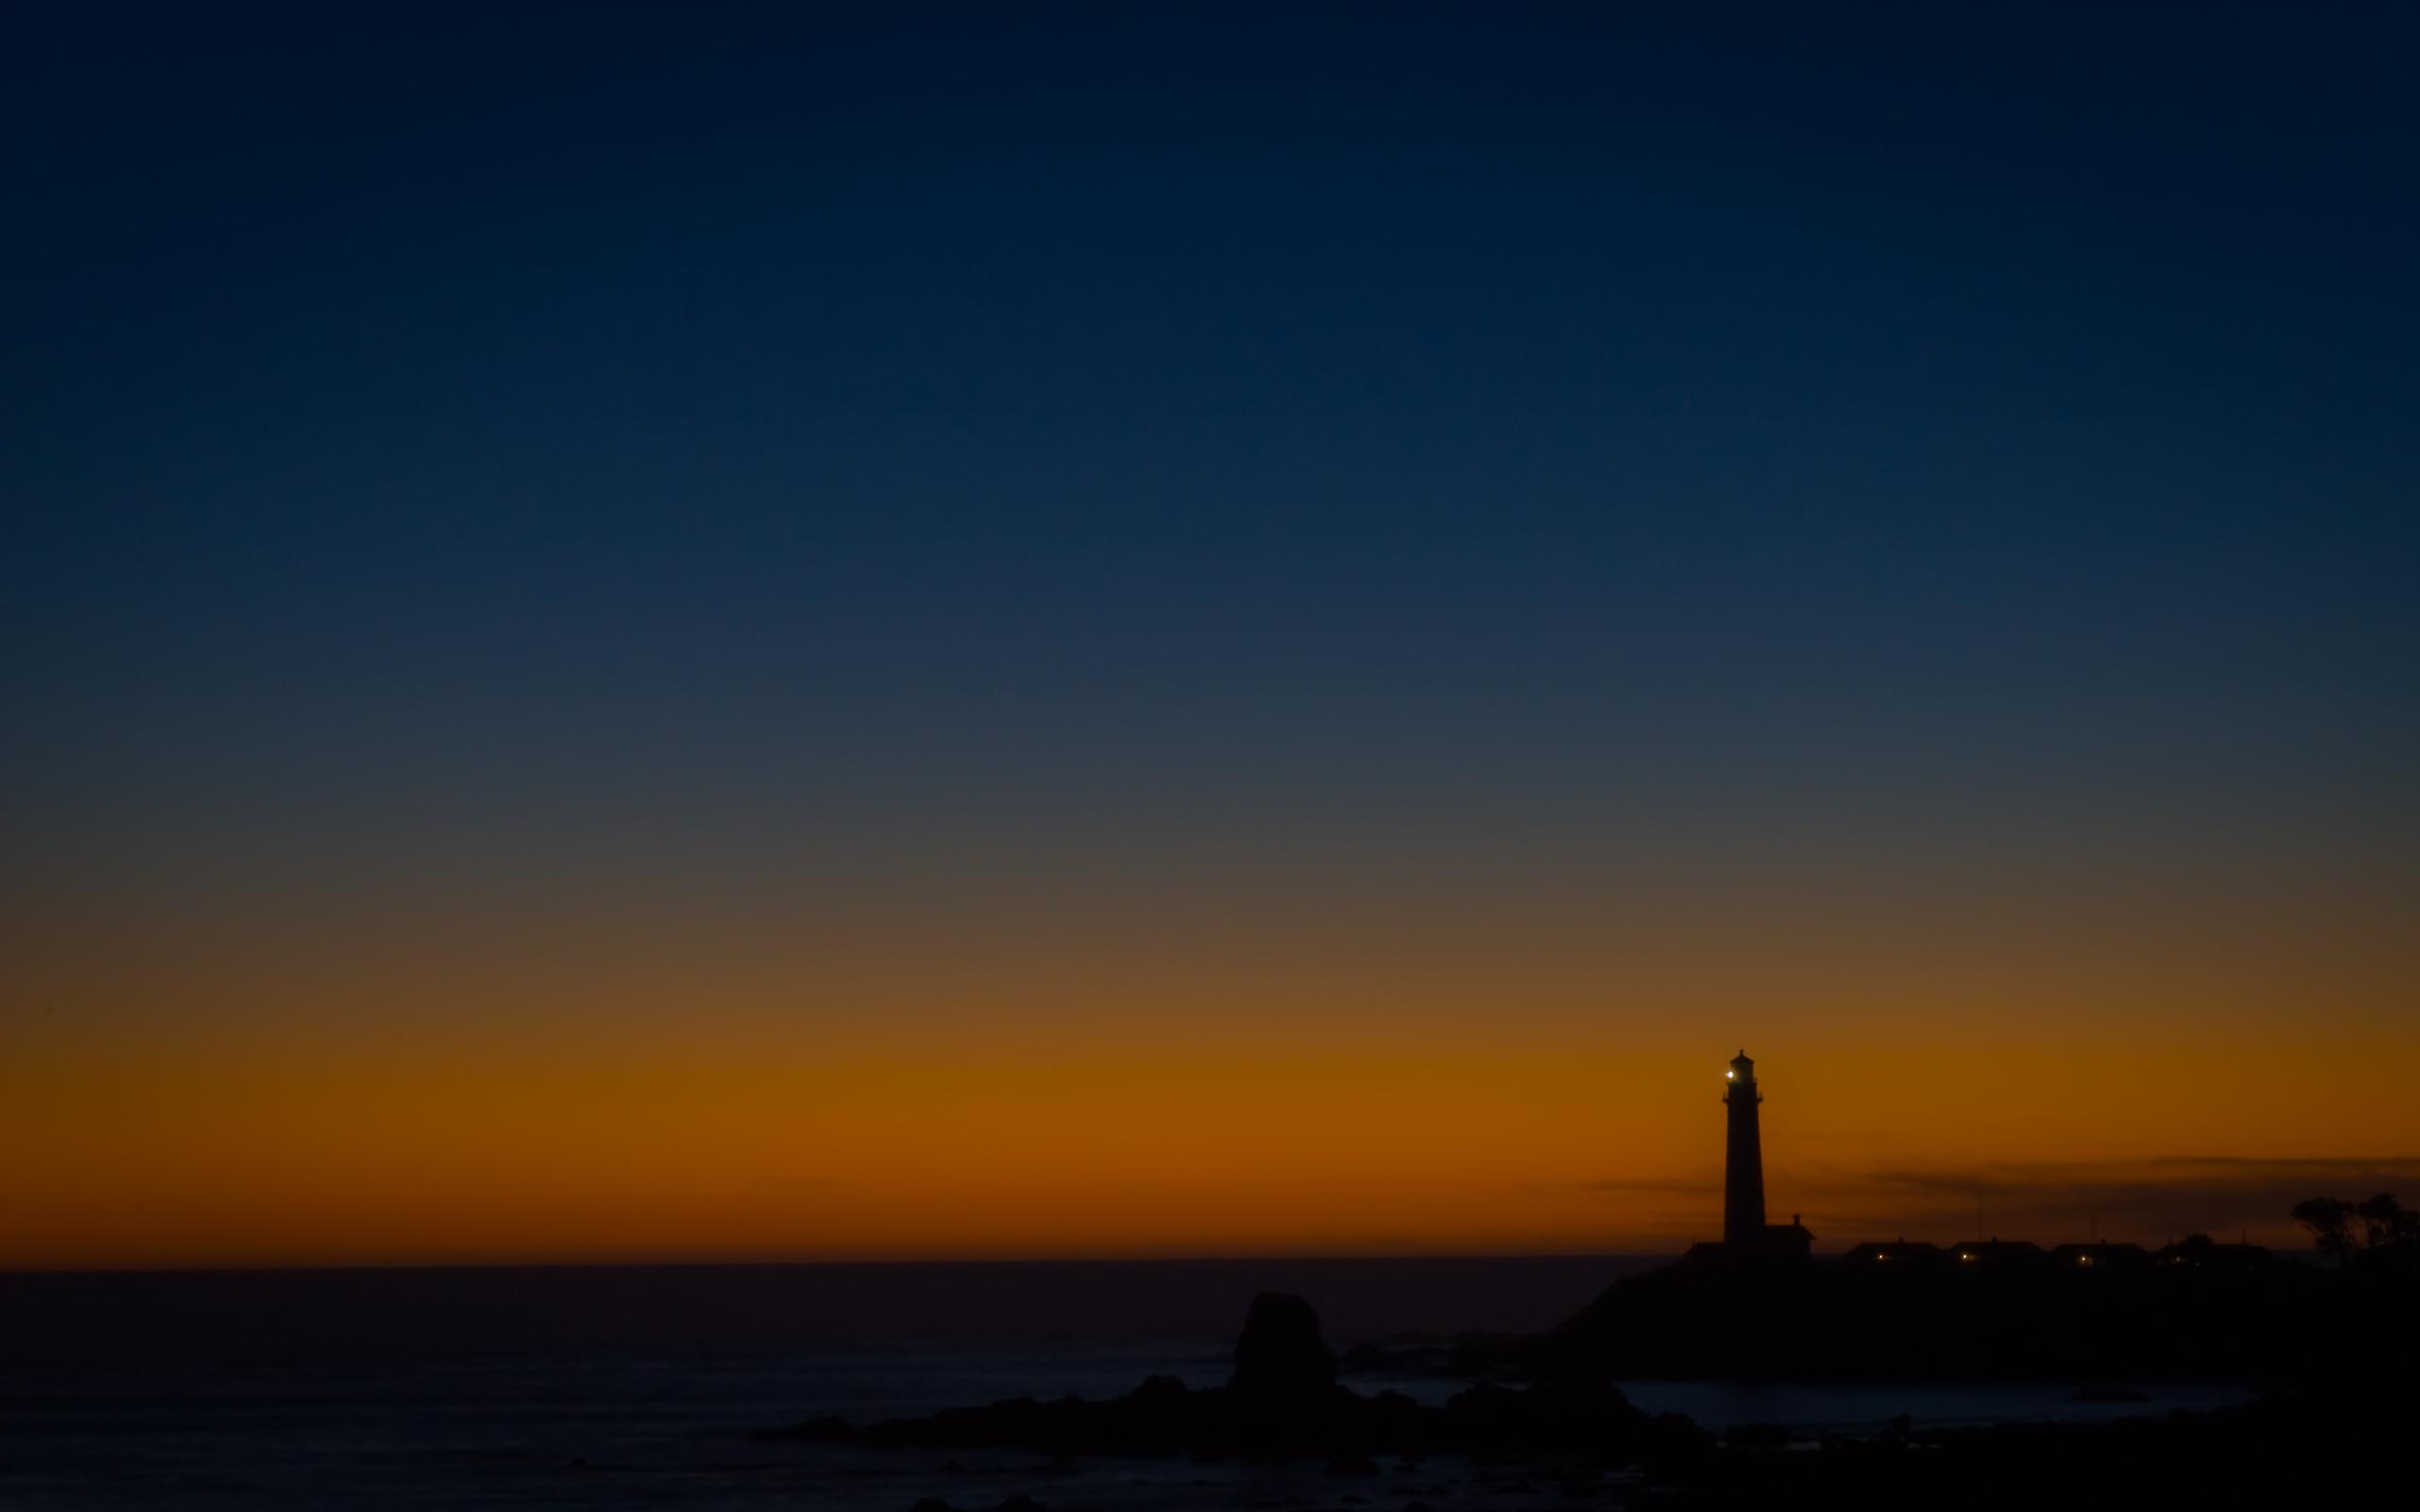 lighthouse at night - HD2560×1600